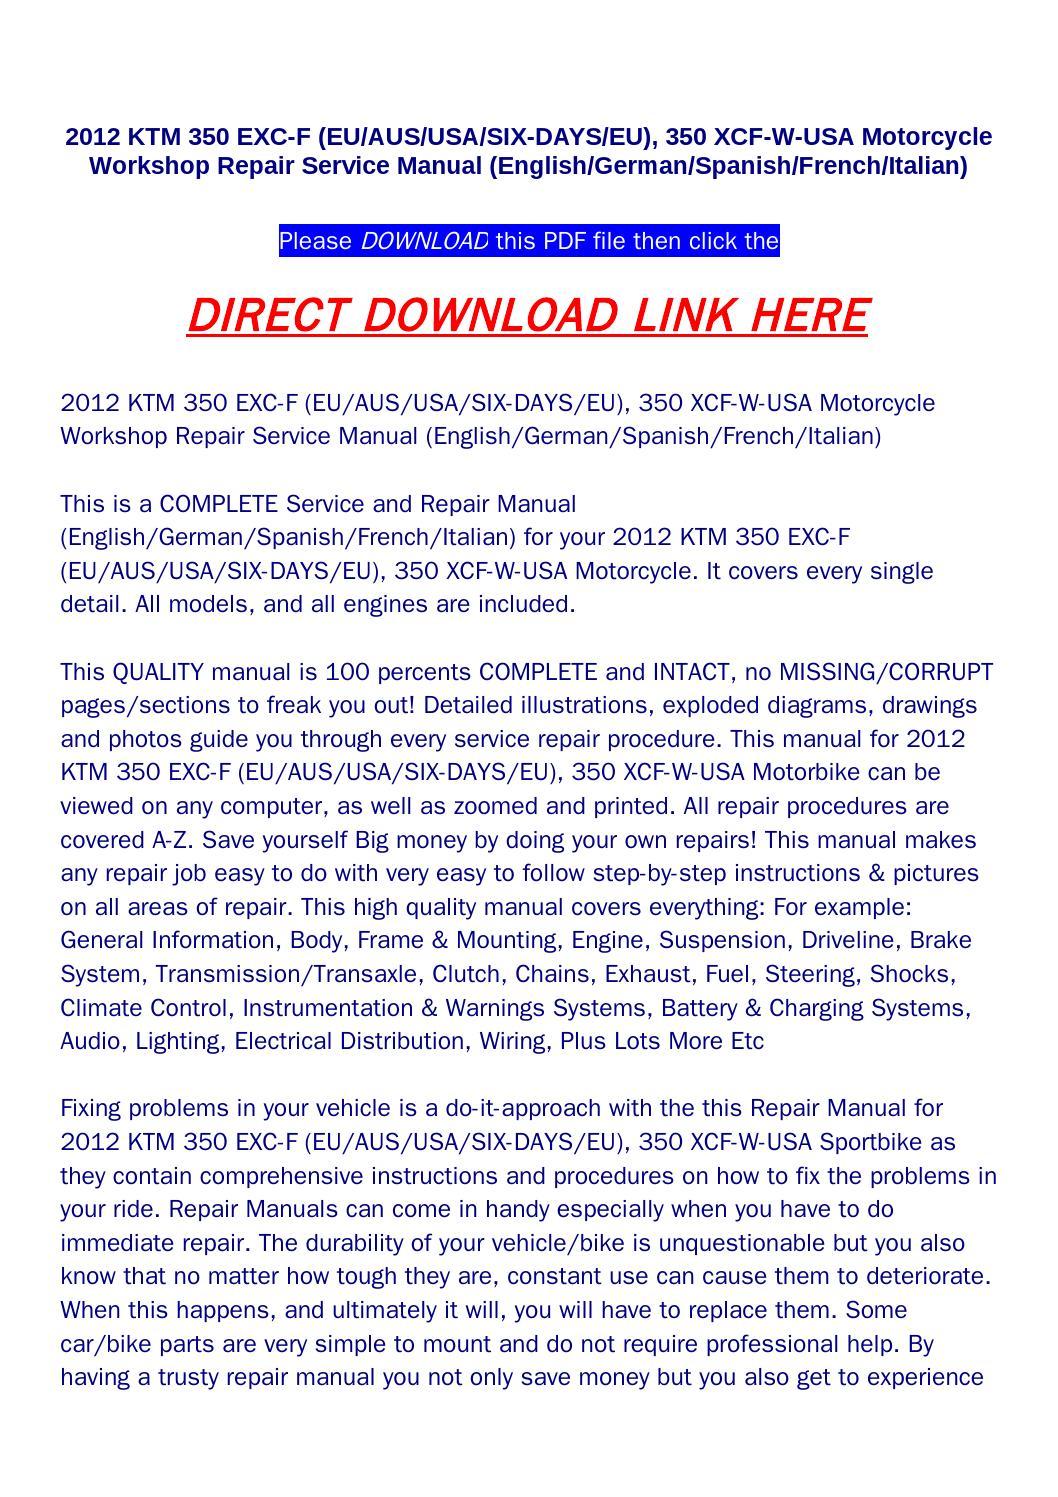 hight resolution of 2012 ktm 350 exc f eu aus usa six days eu 350 xcf